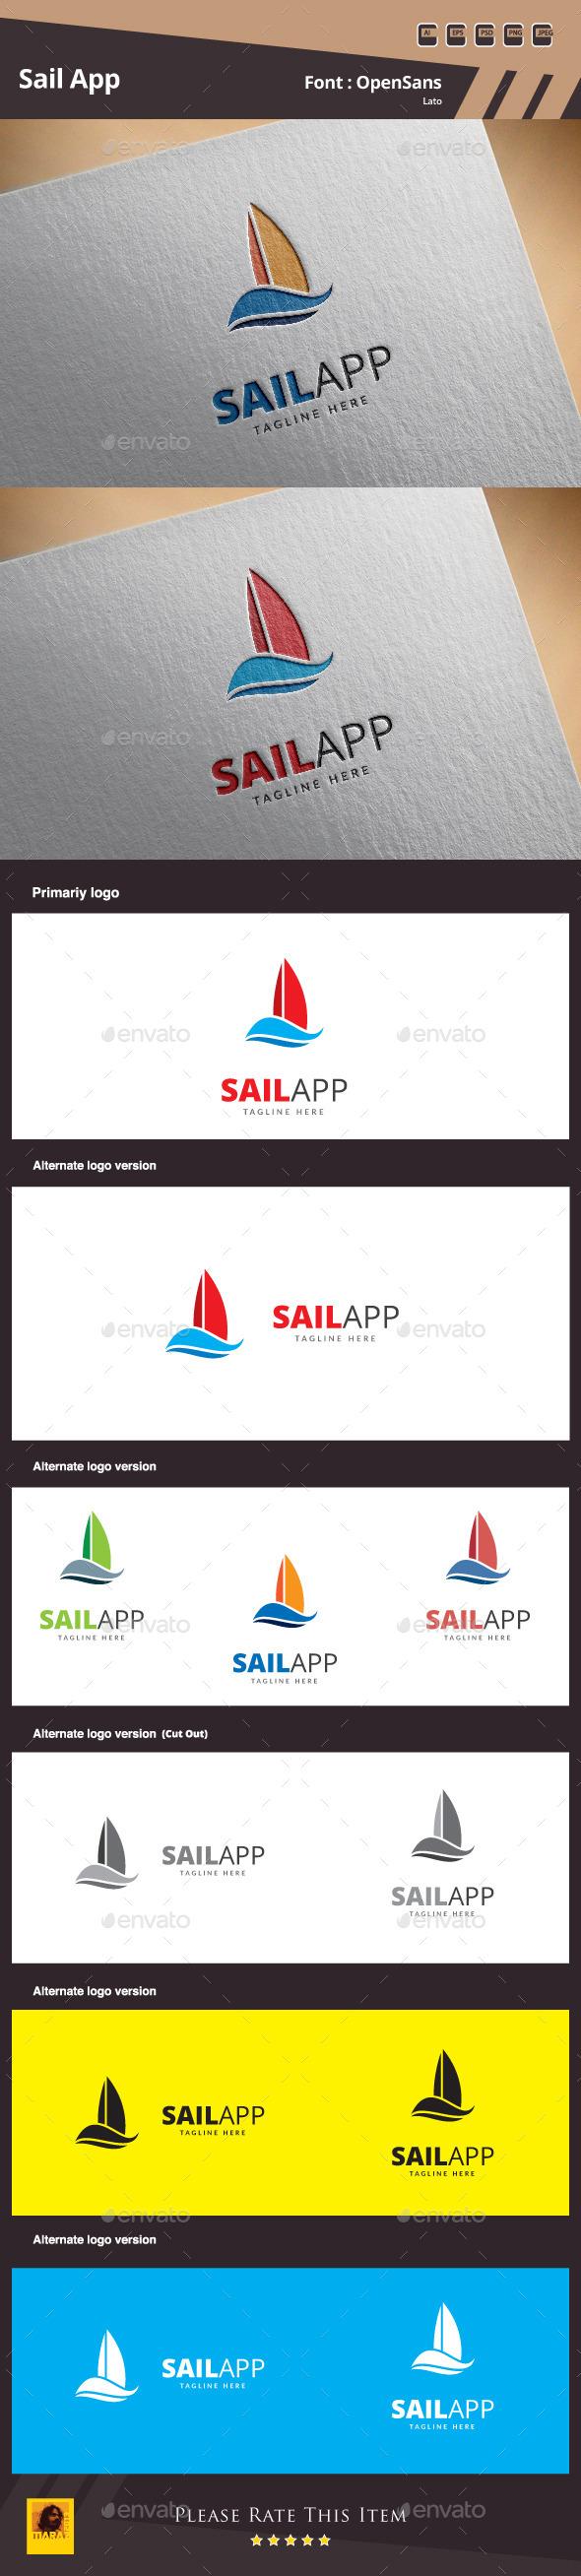 GraphicRiver Sail App Logo Template 10487177